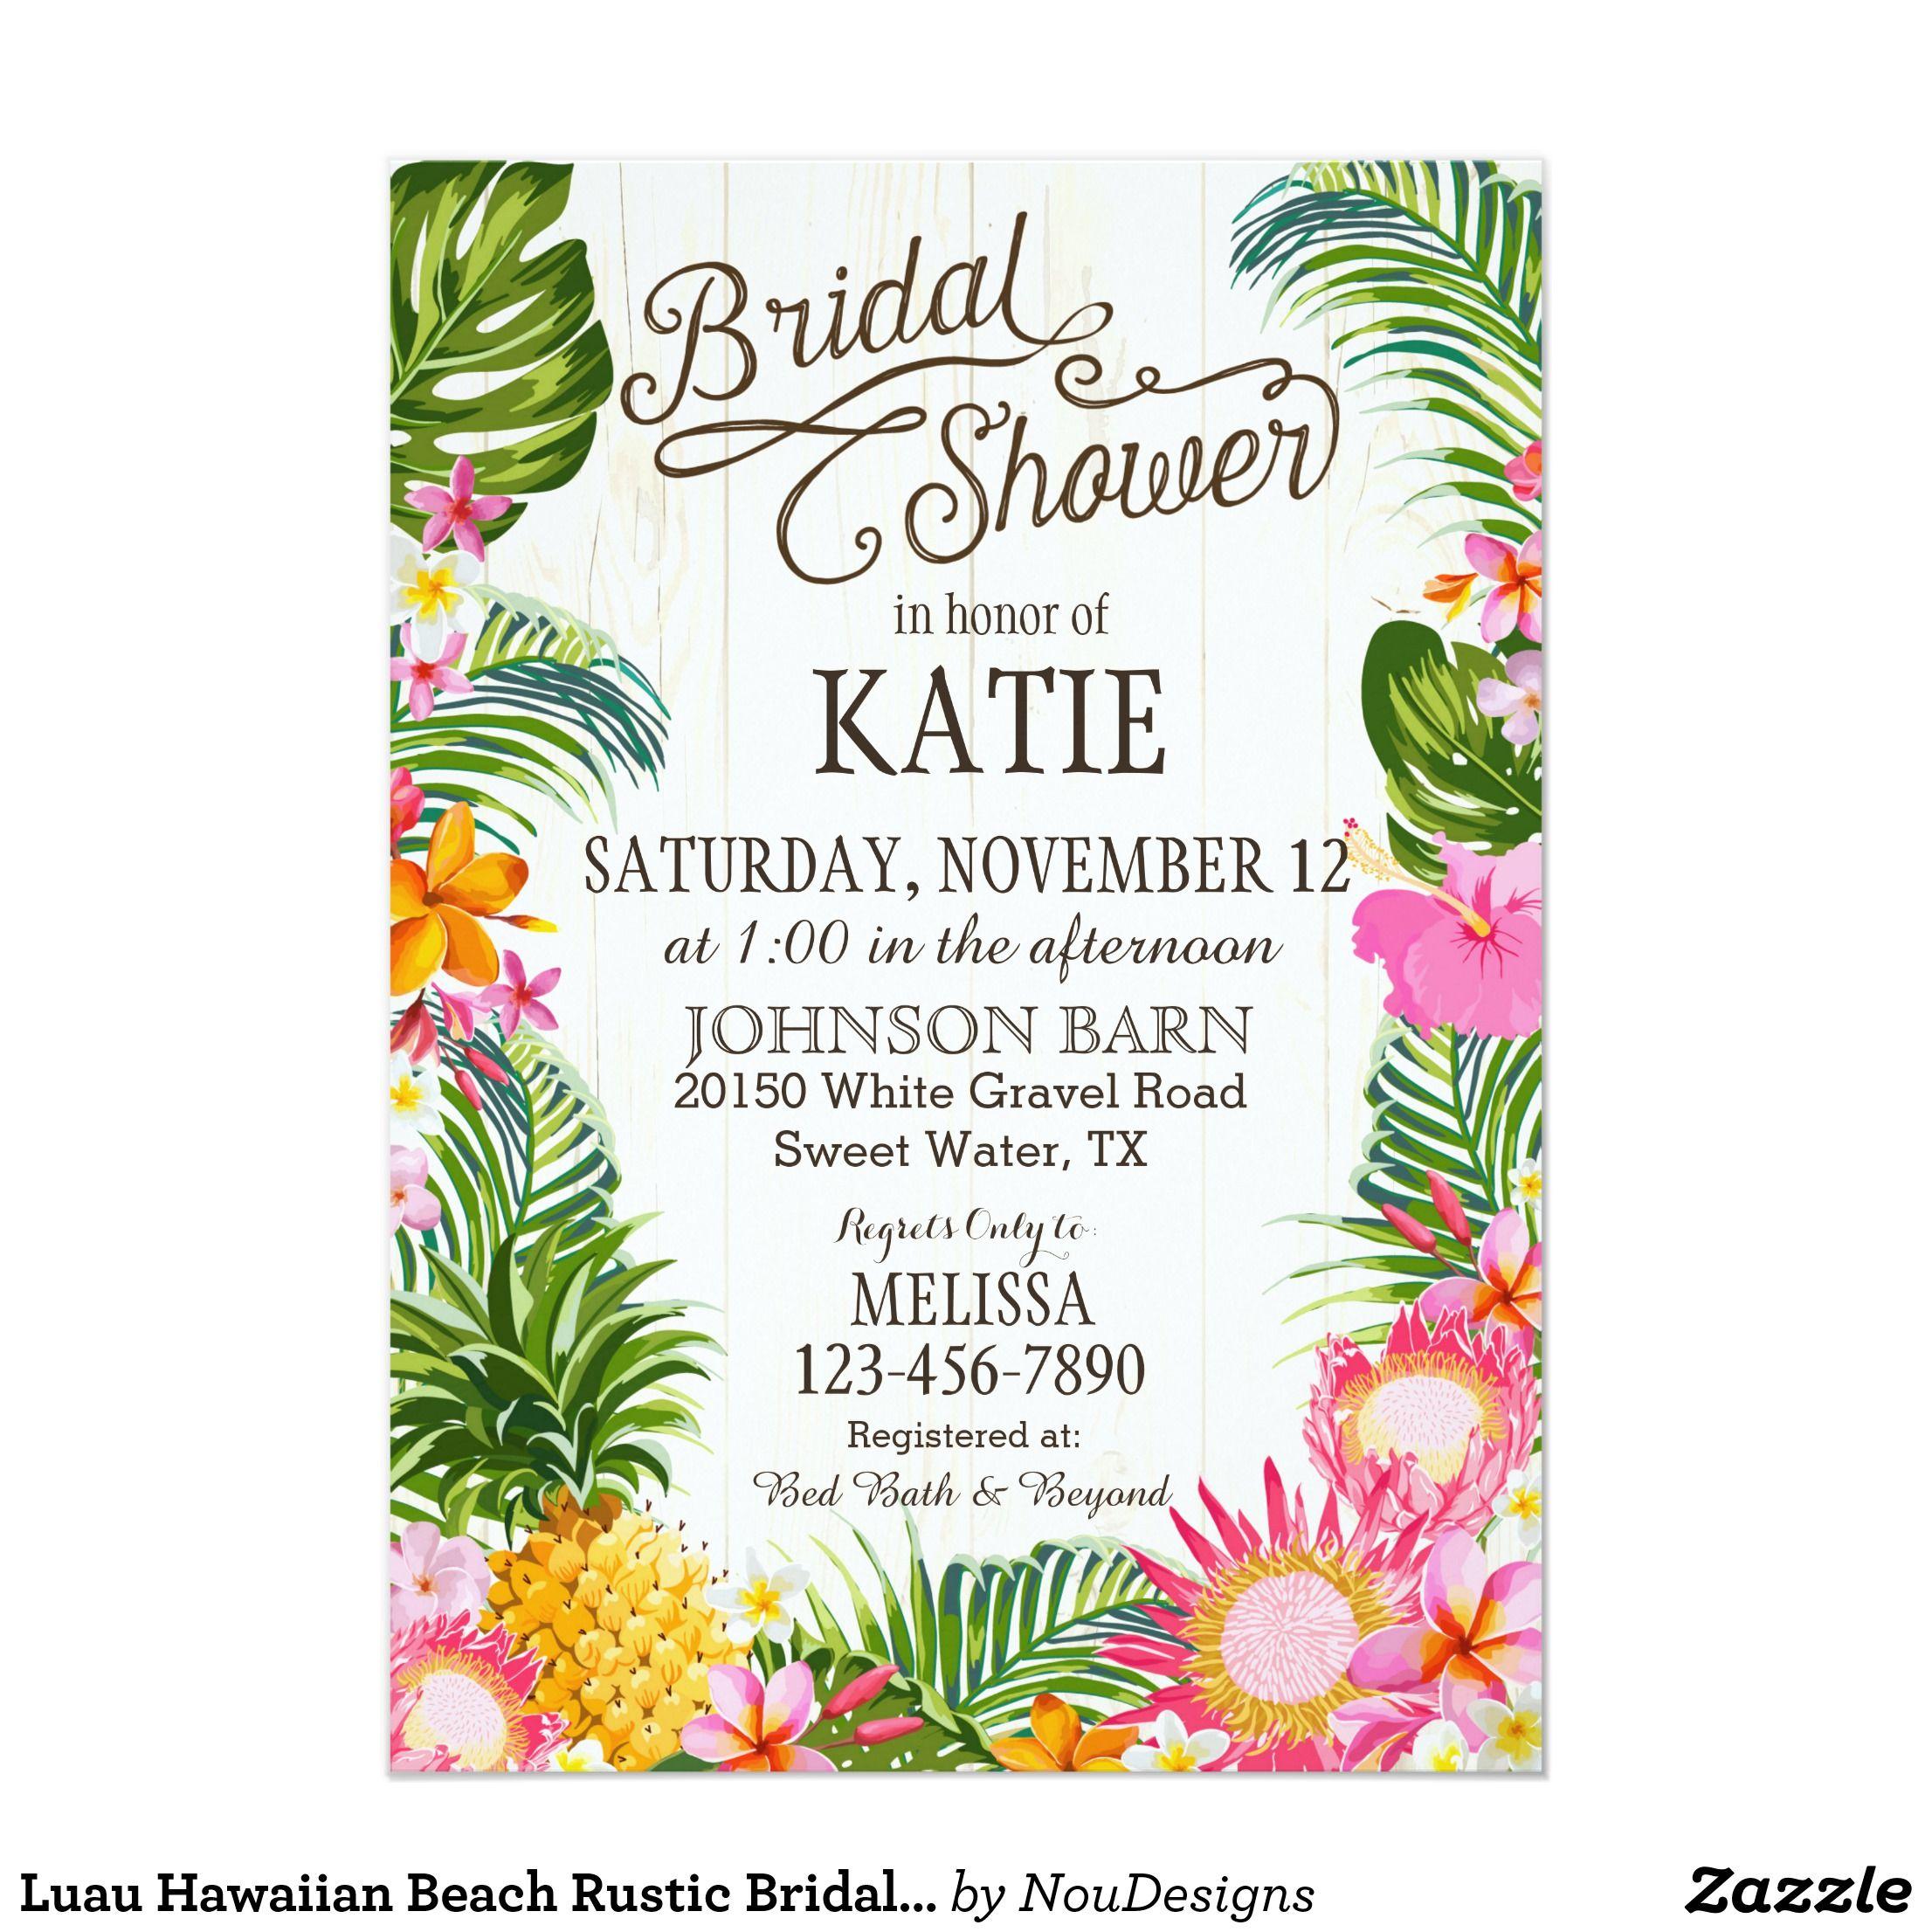 Luau Hawaiian Beach Rustic Bridal Shower Invitation